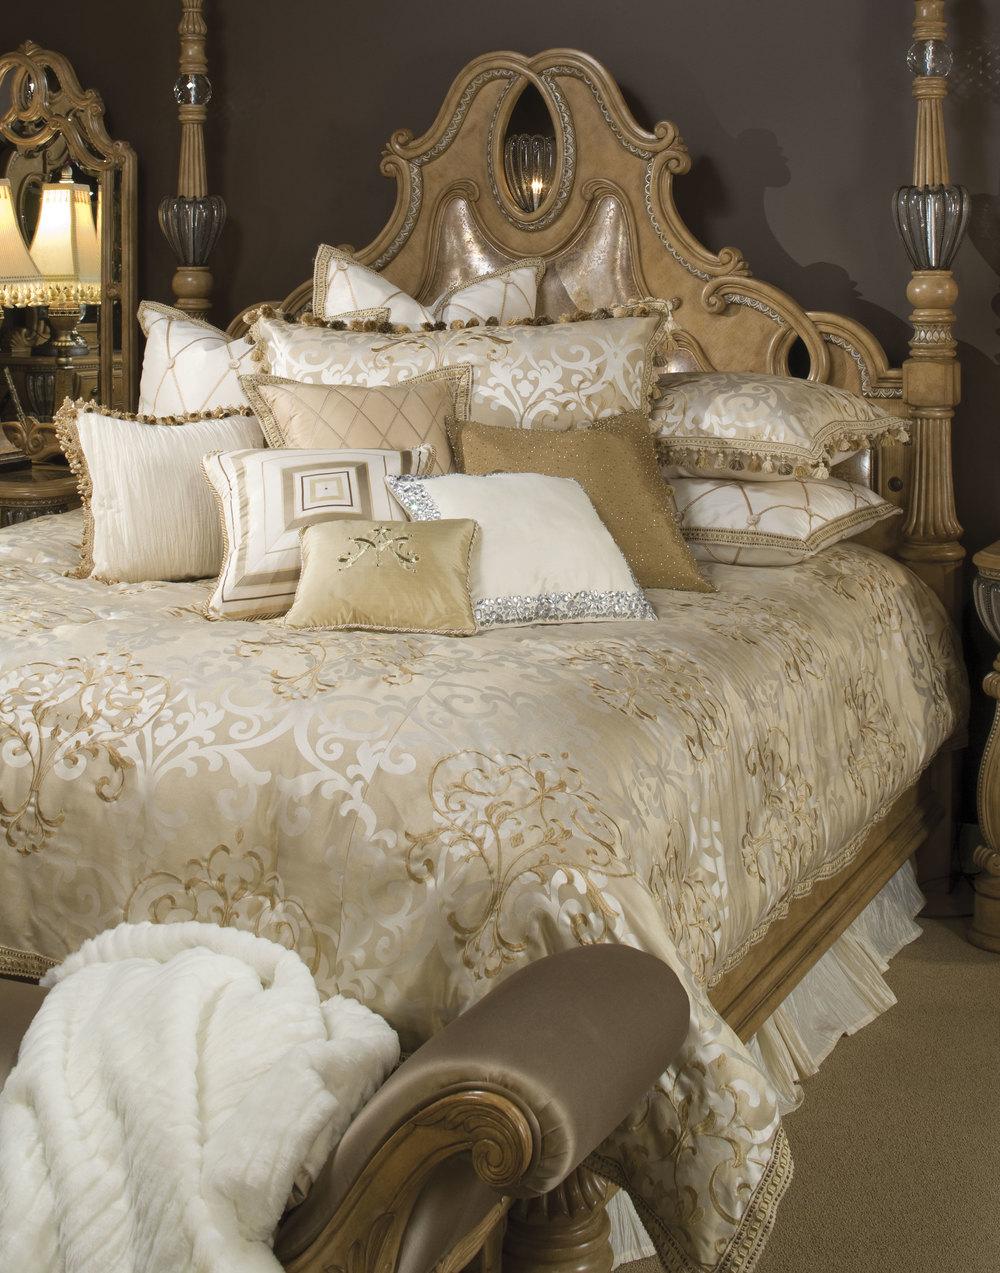 Michael Amini - Luxembourg Queen Comforter Set, 12 pc